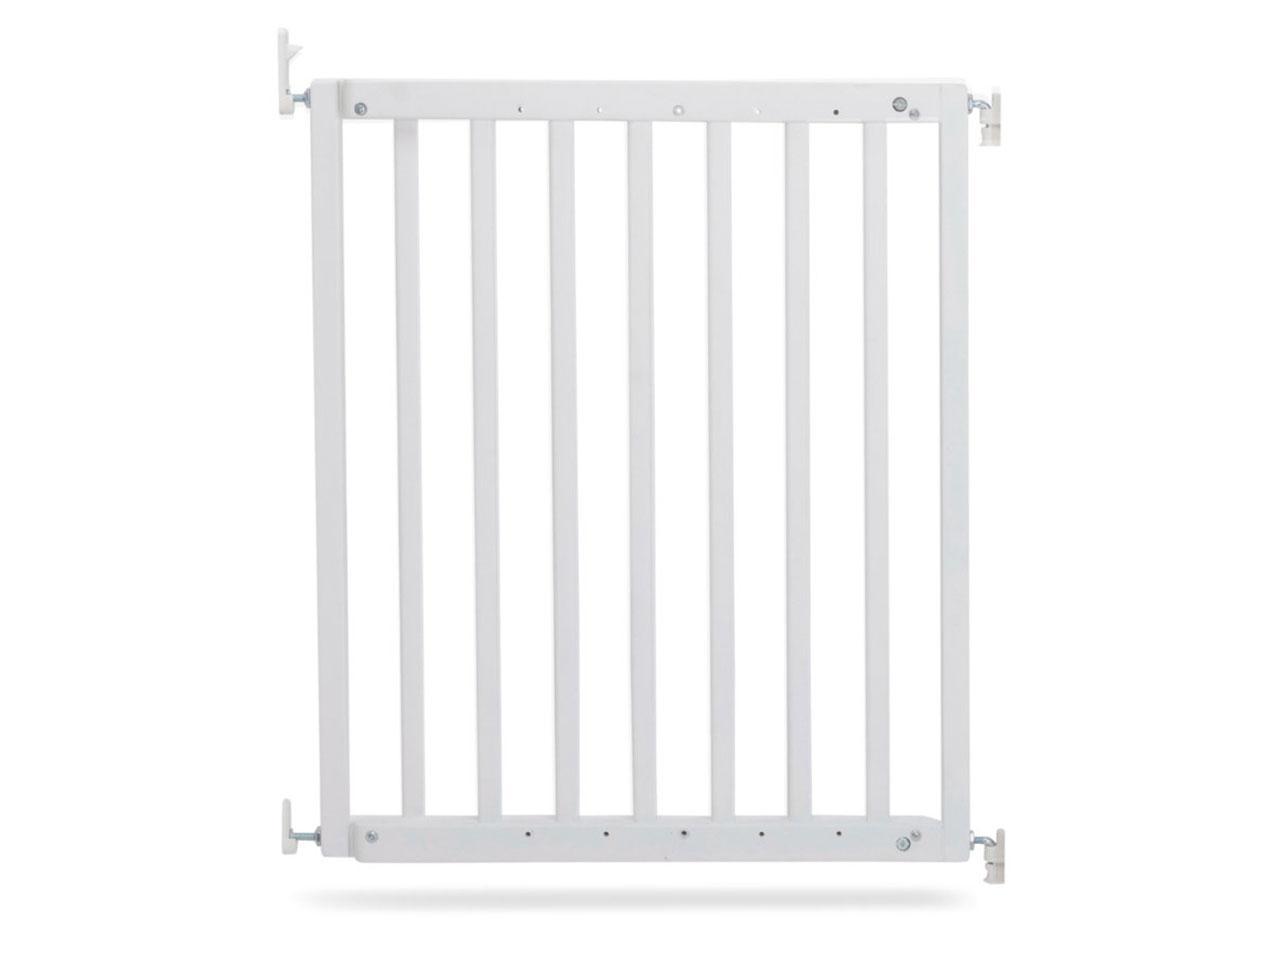 Zábrana do dveří a schodišť GEUTHER 63-103,5 cm, bílá